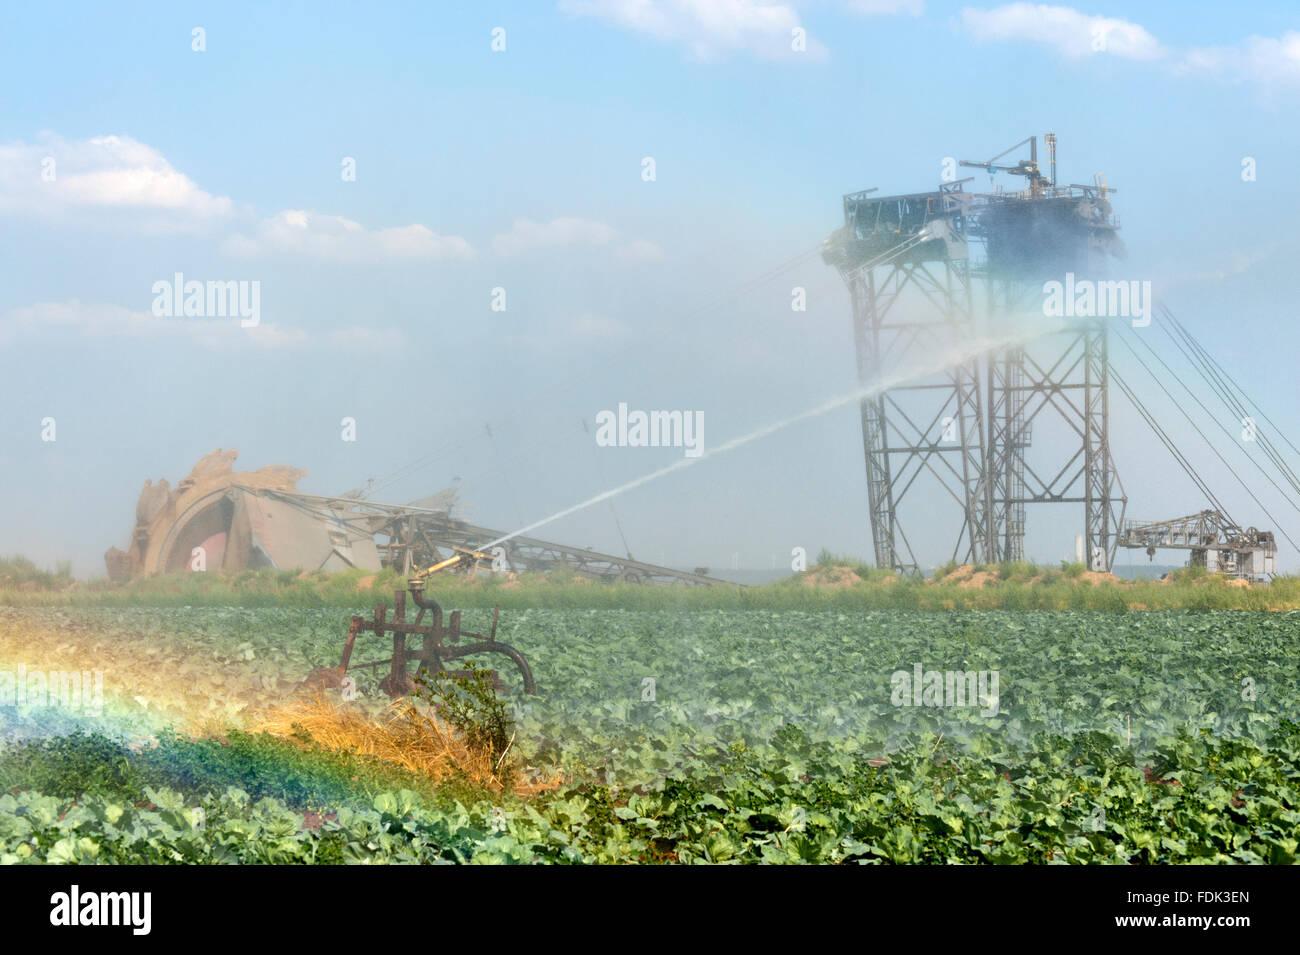 watering,opencast,cultural landscape,garzweiler,bucket excavator,pit mine - Stock Image